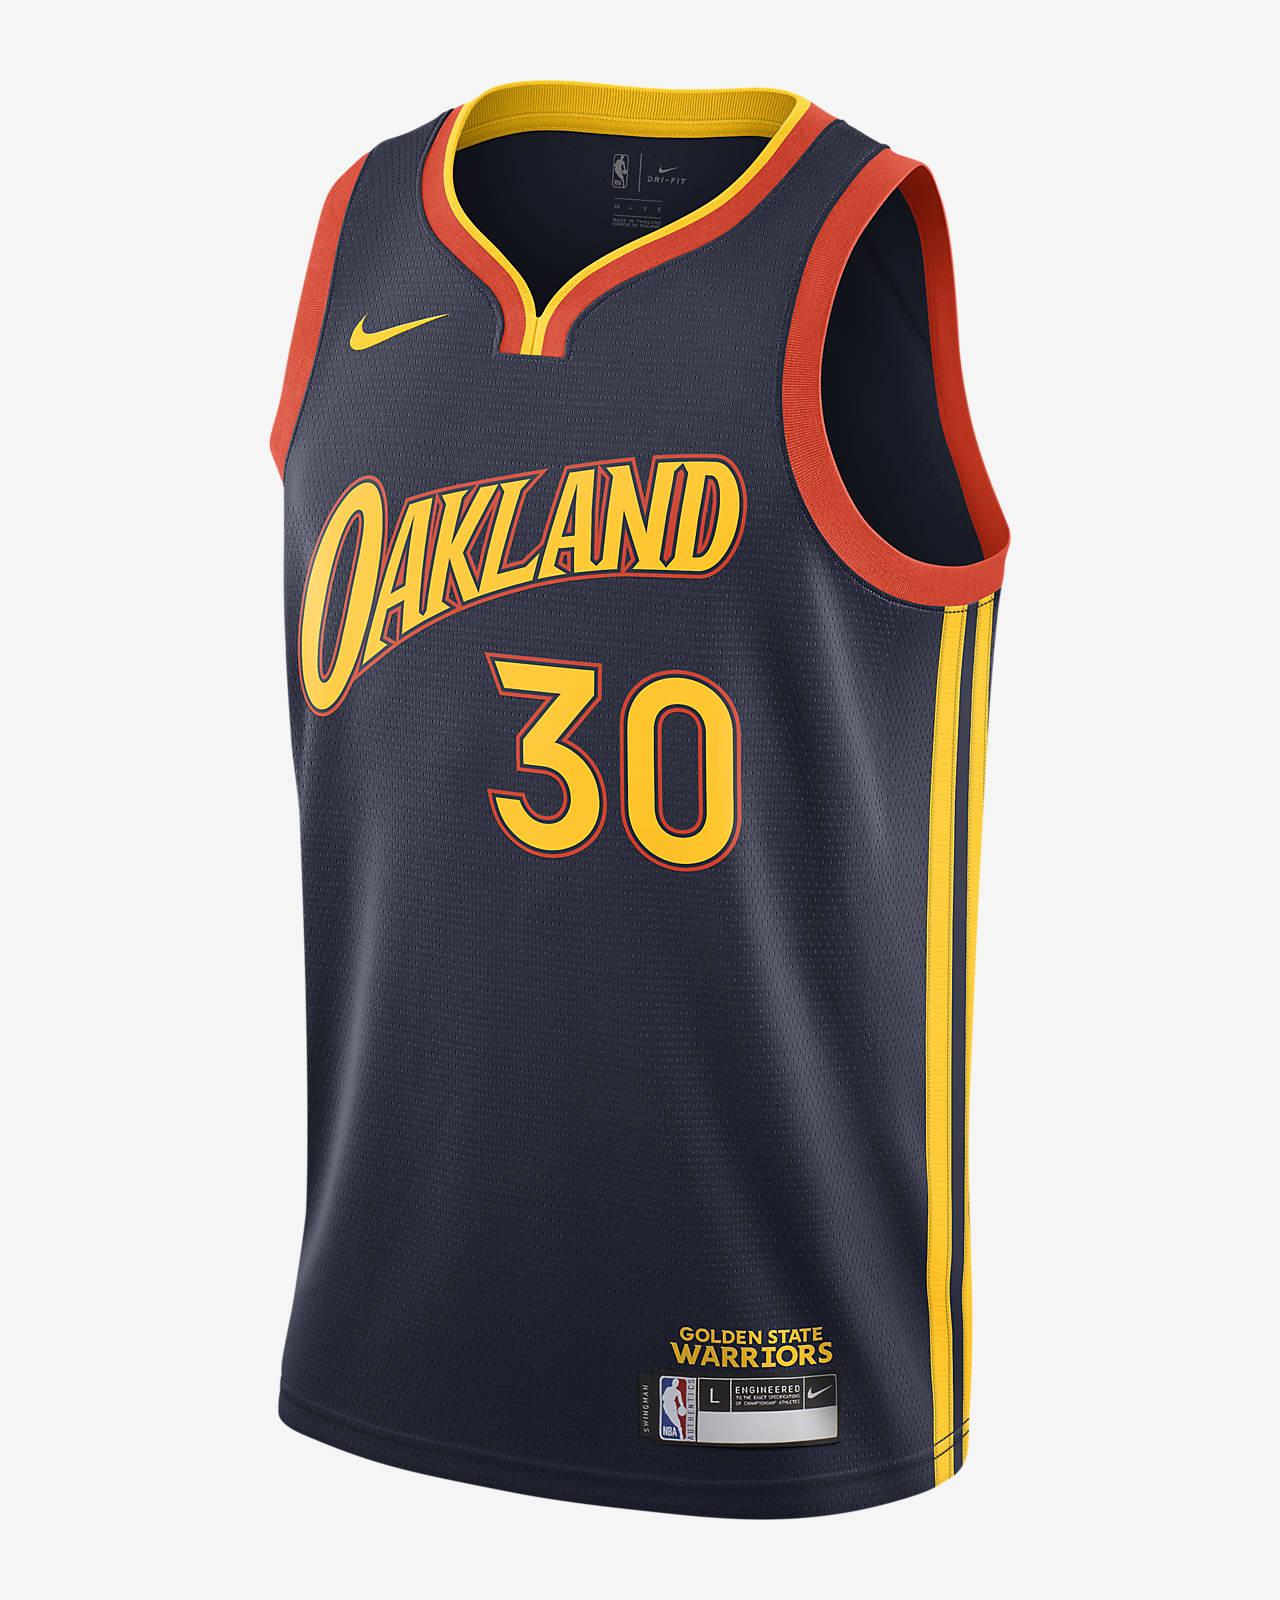 Dres Nike NBA Swingman Stephen Curry Warriors City Edition pro větší děti